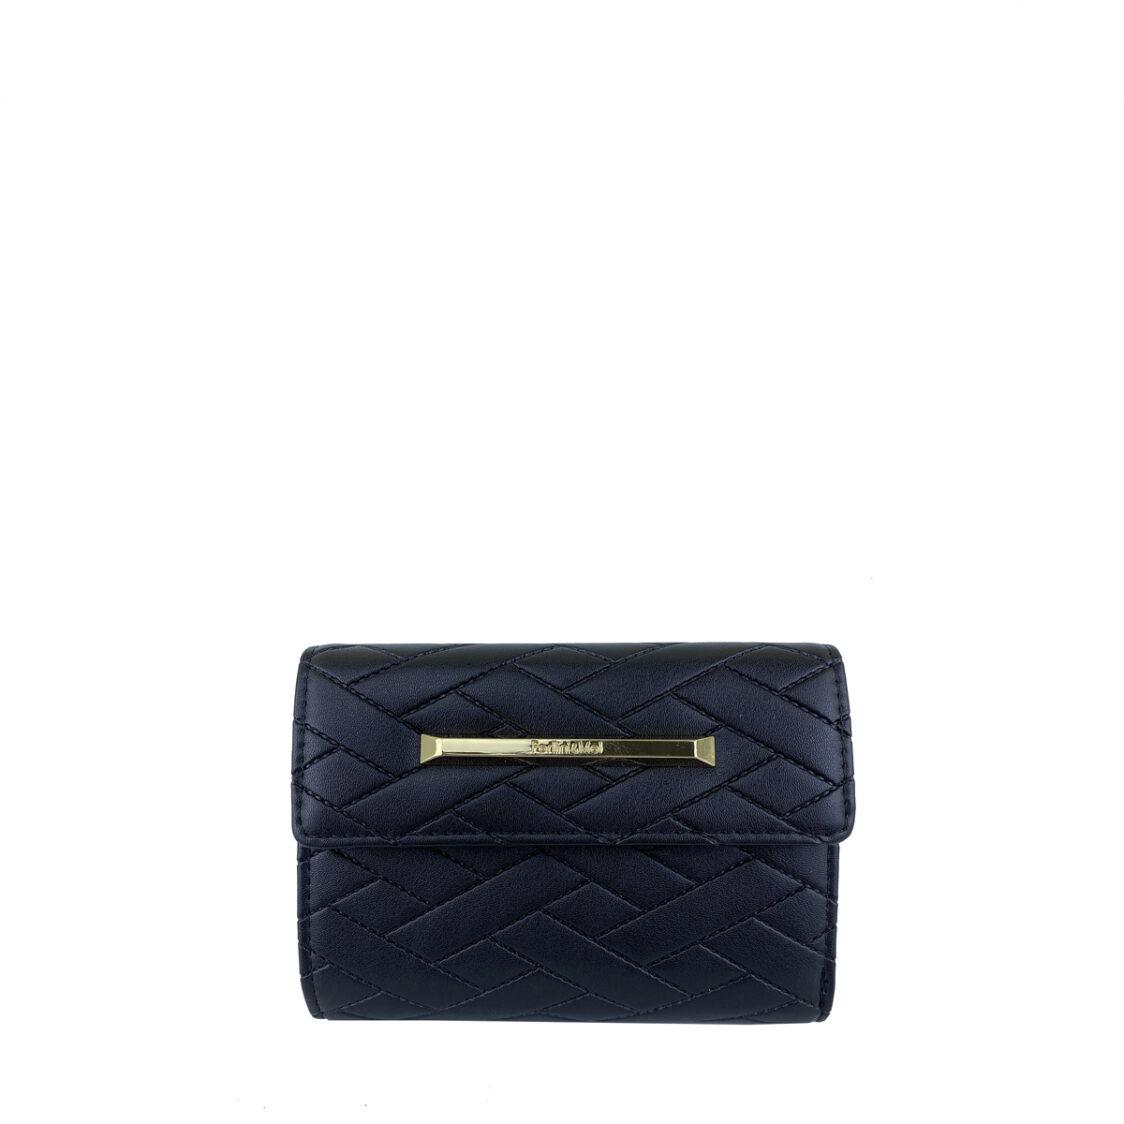 PerlliniMel Weave Embossed Mid Size Wallet X Black